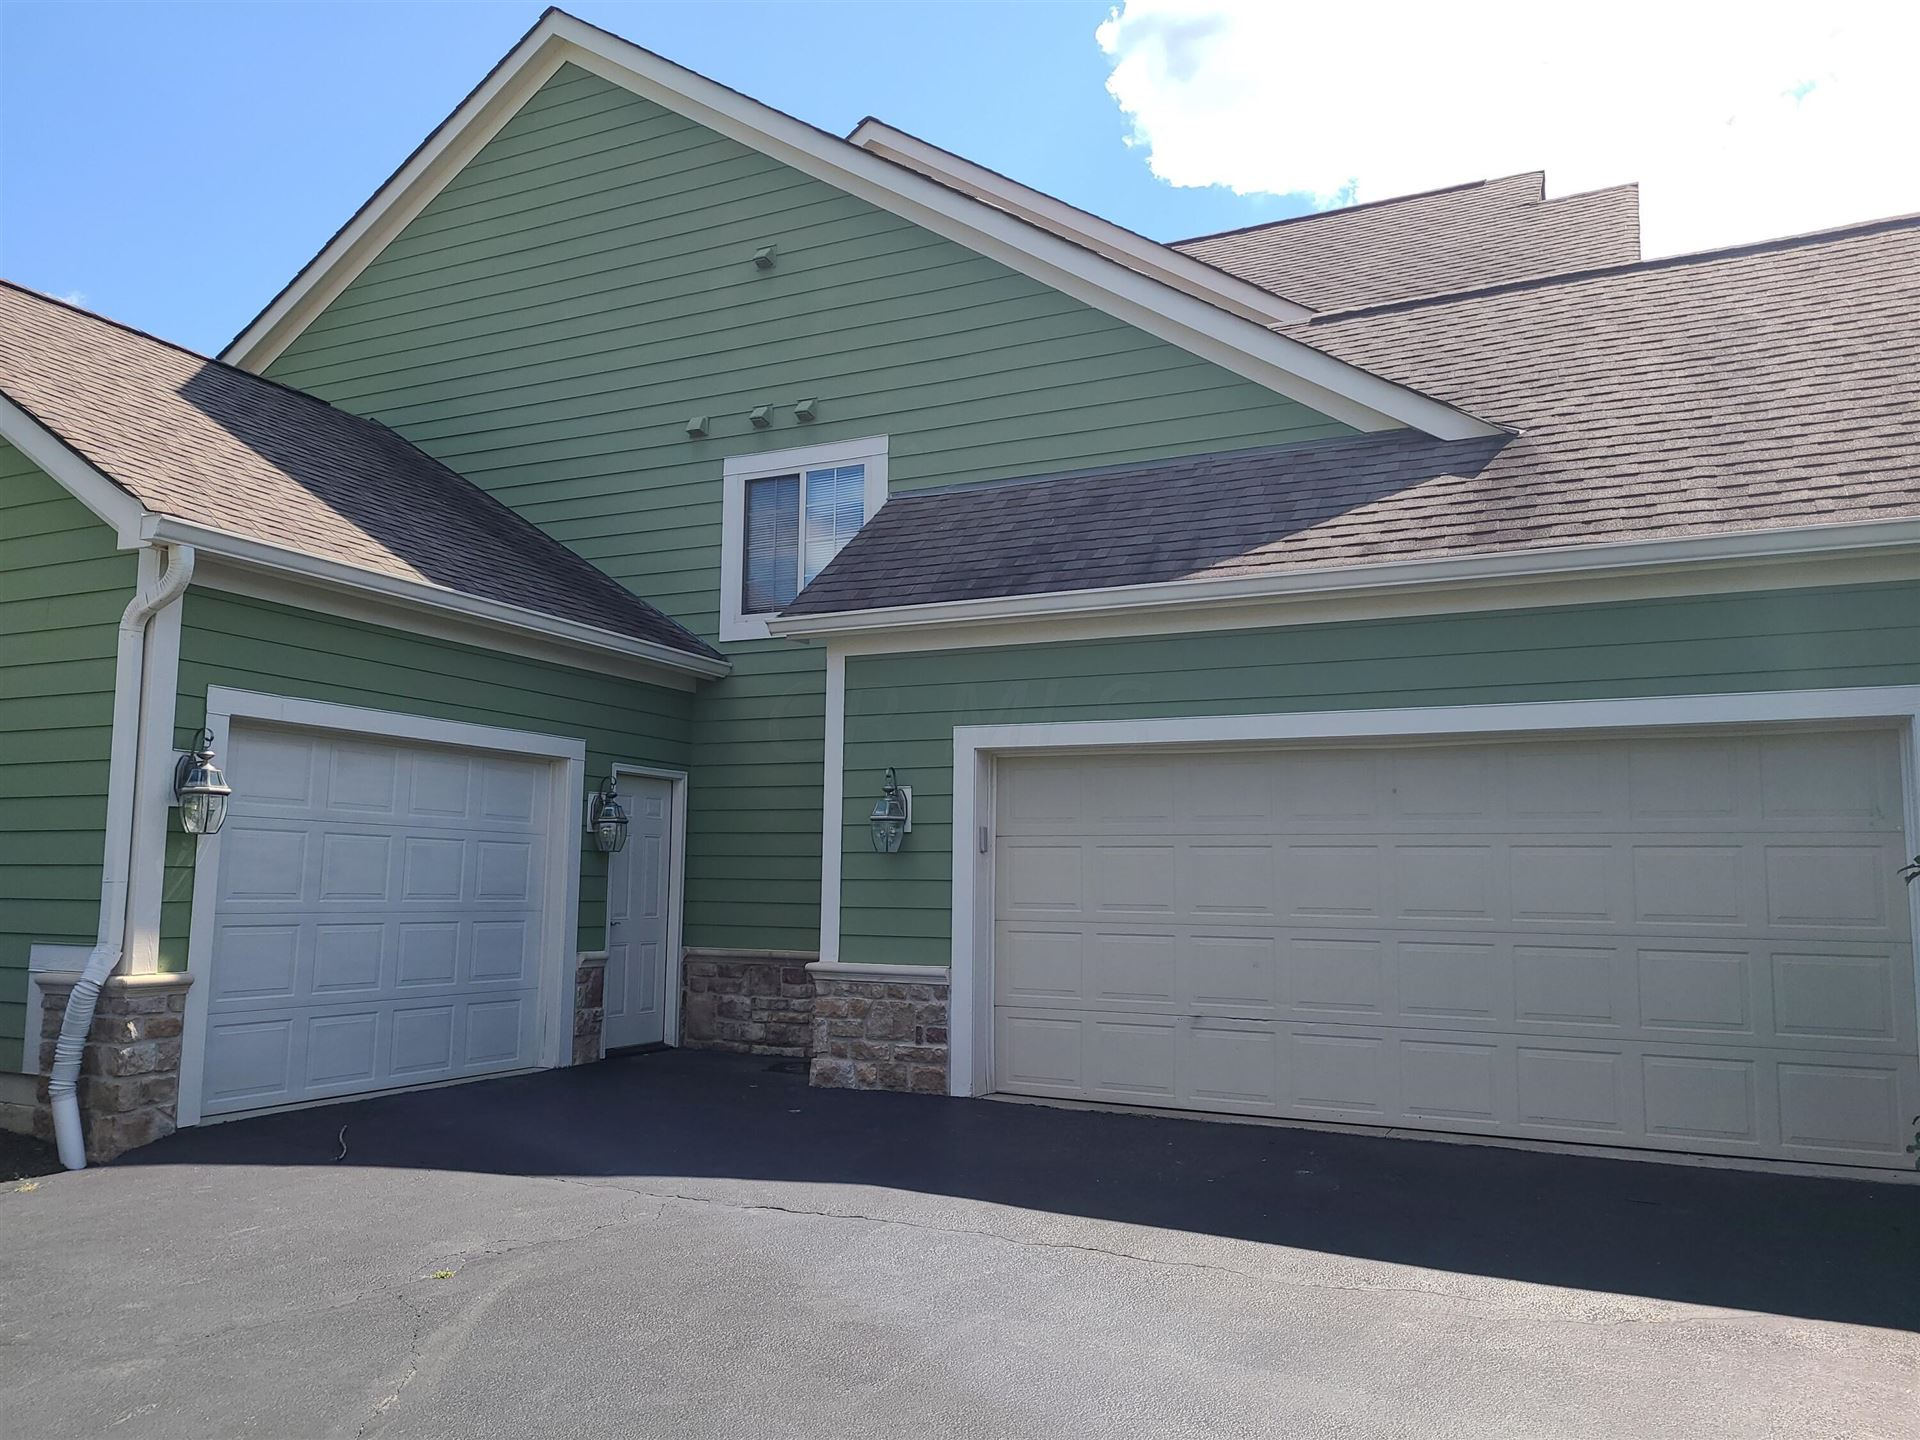 Photo of 2503 Bay Harbor Drive, Galena, OH 43021 (MLS # 221034895)